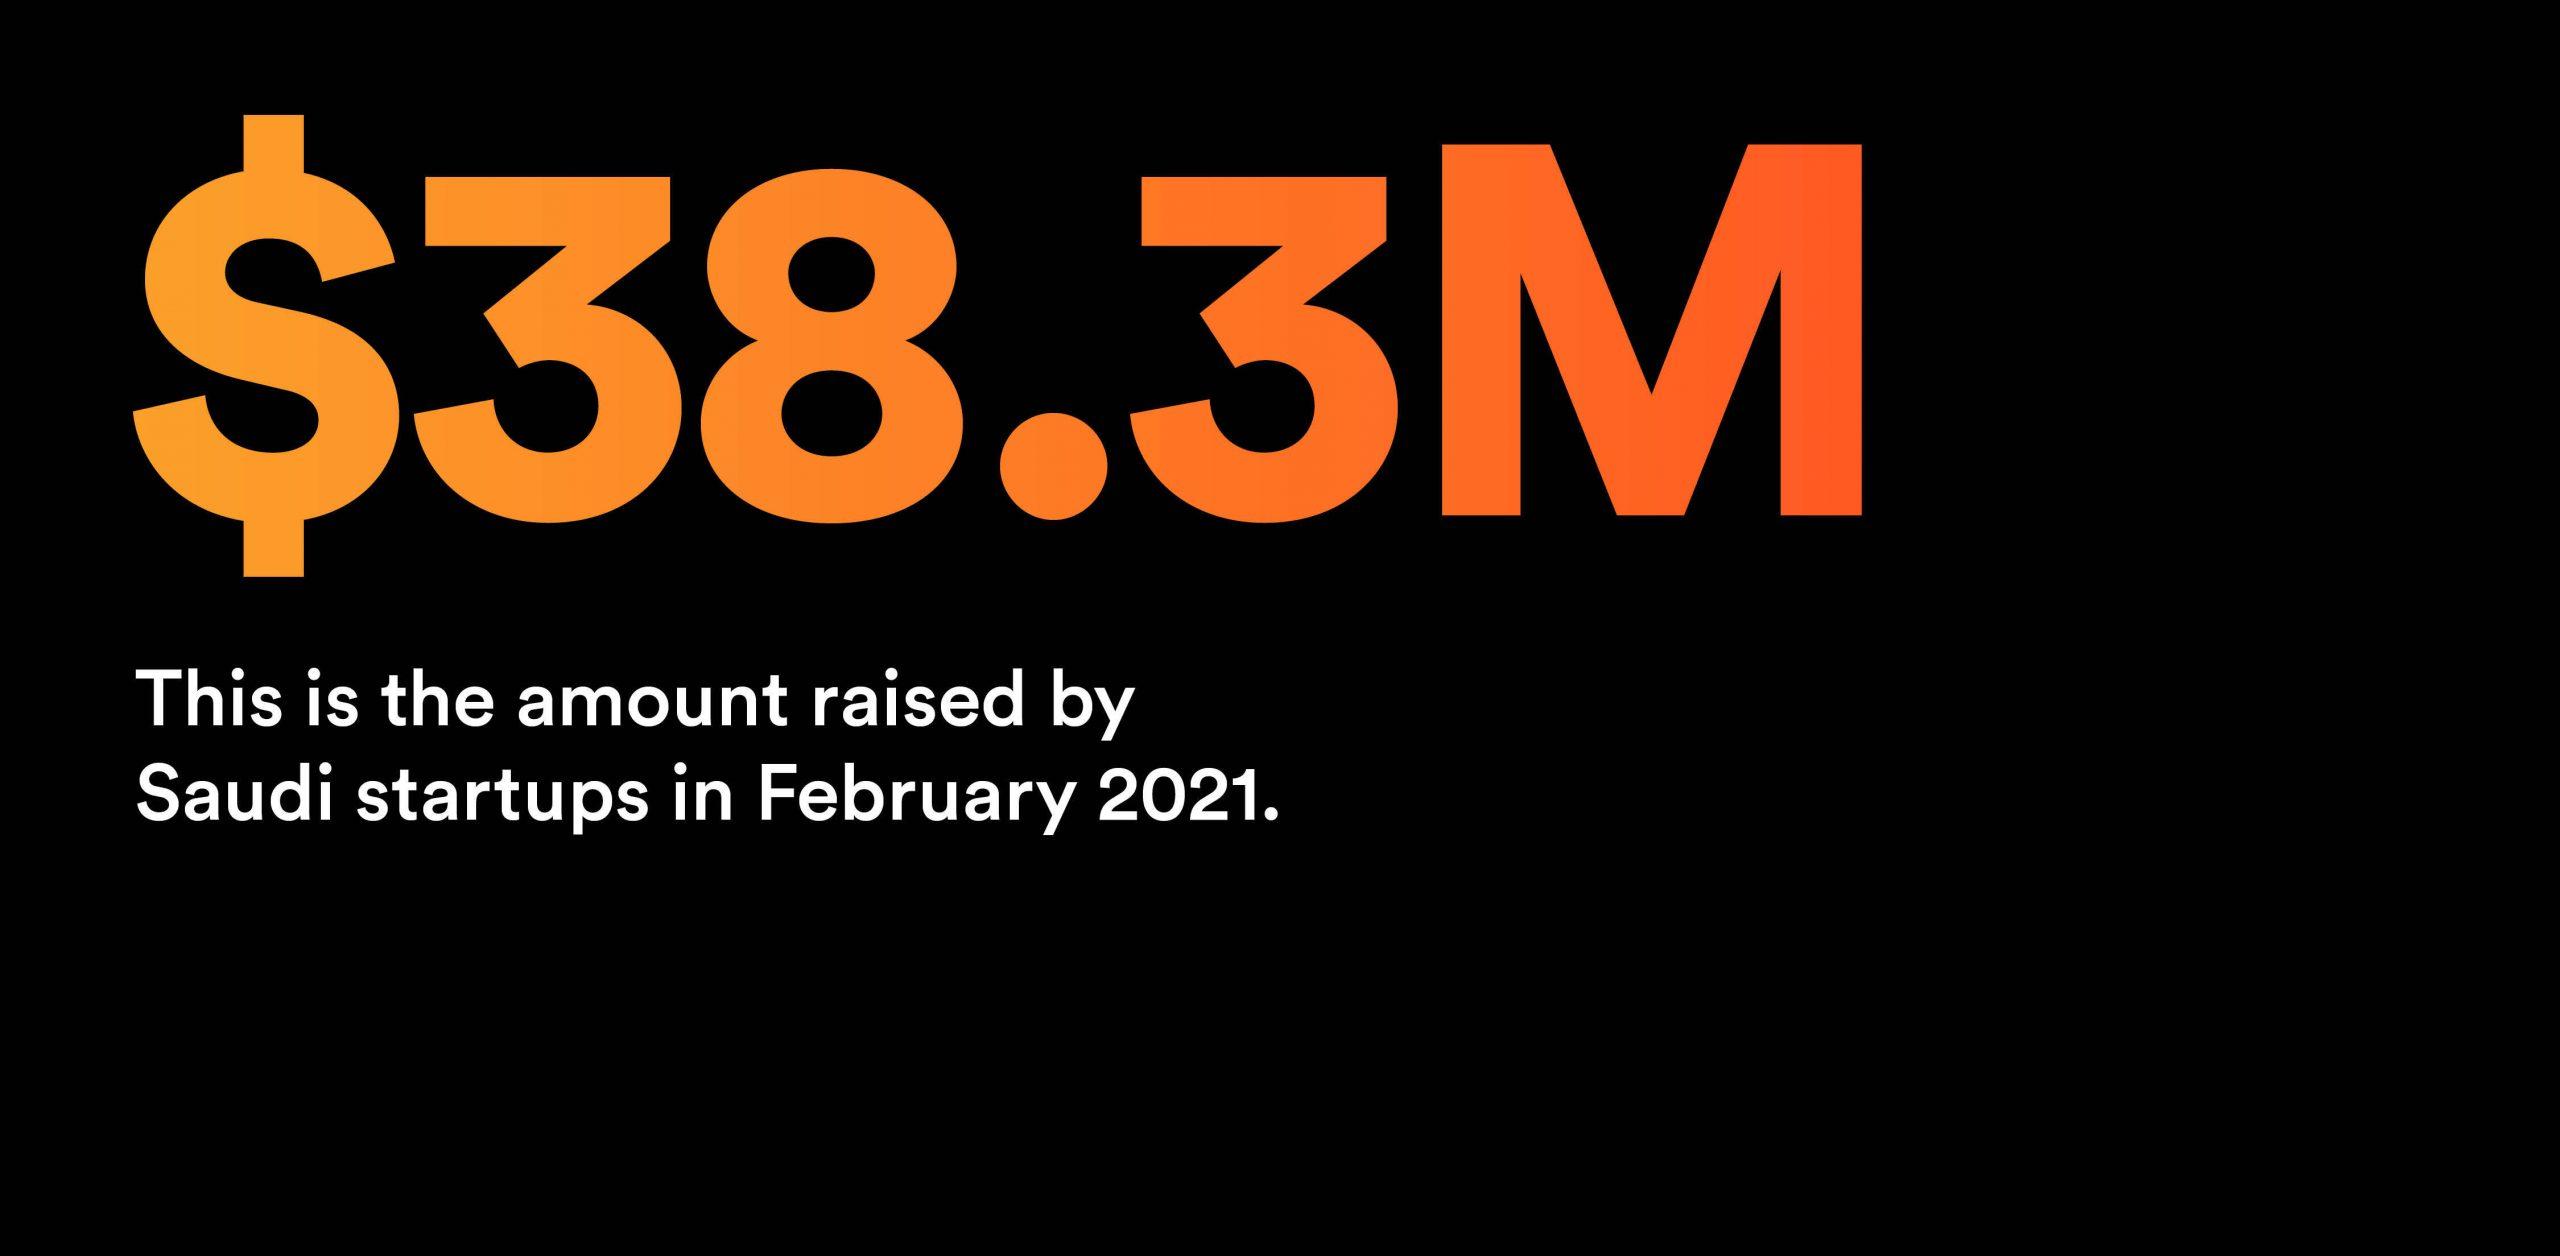 Startups in Saudi Arabia Raised $38.3 Million in February 2021